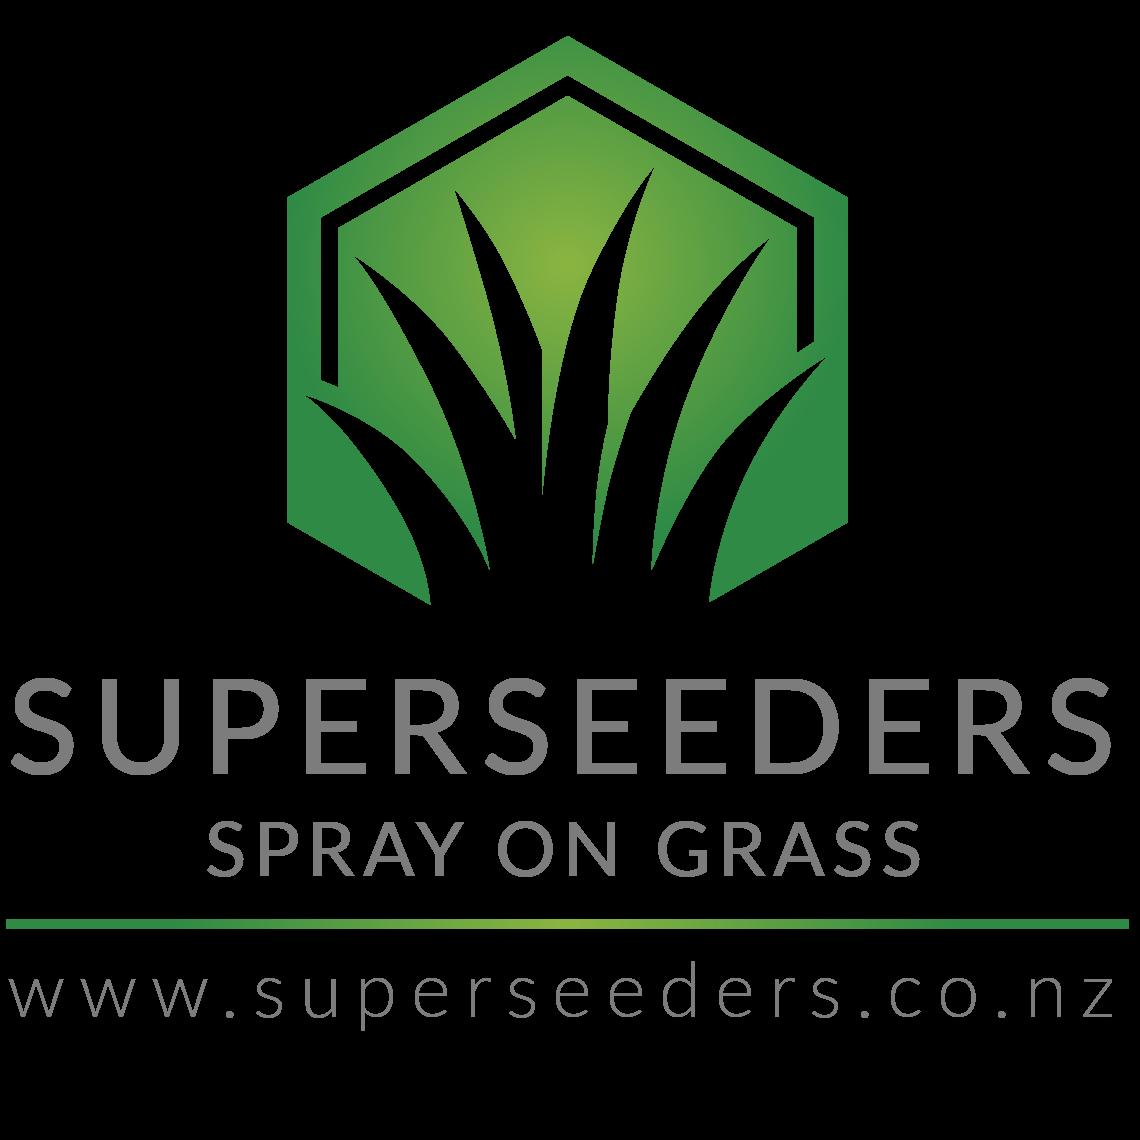 SuperSeeders